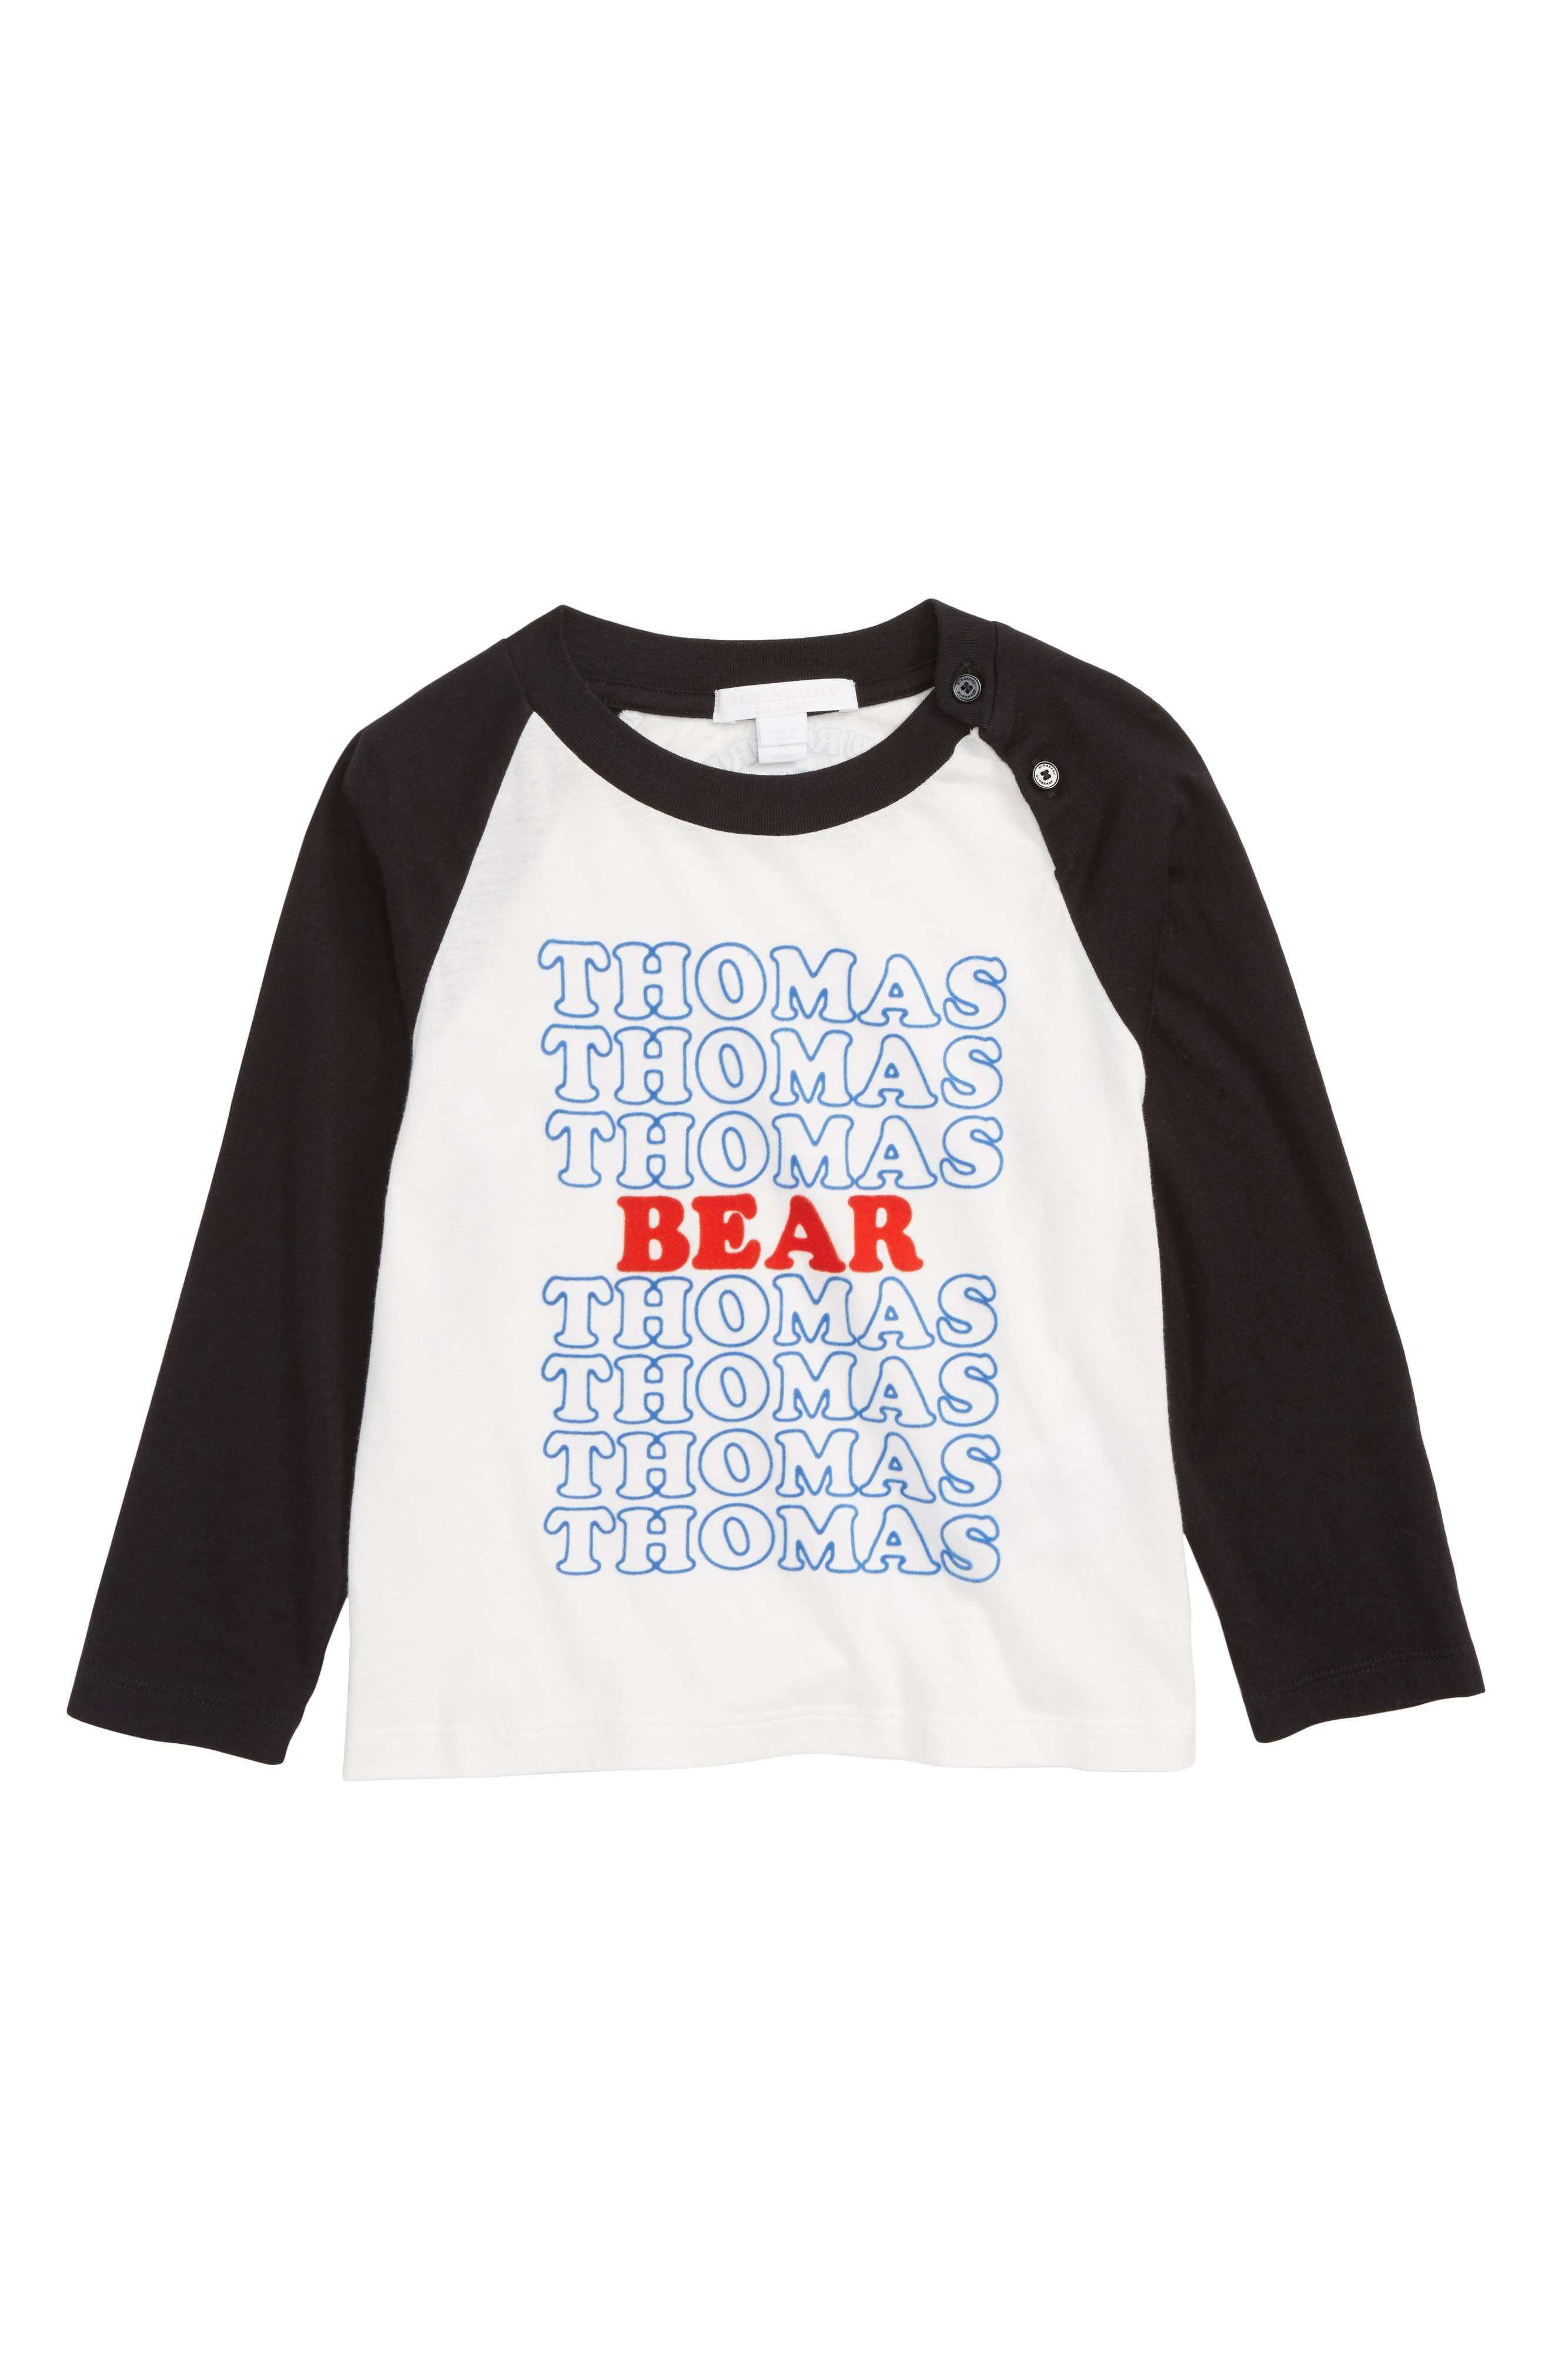 BURBERRY, Thomas Bear Raglan Shirt, Main thumbnail 1, color, 100